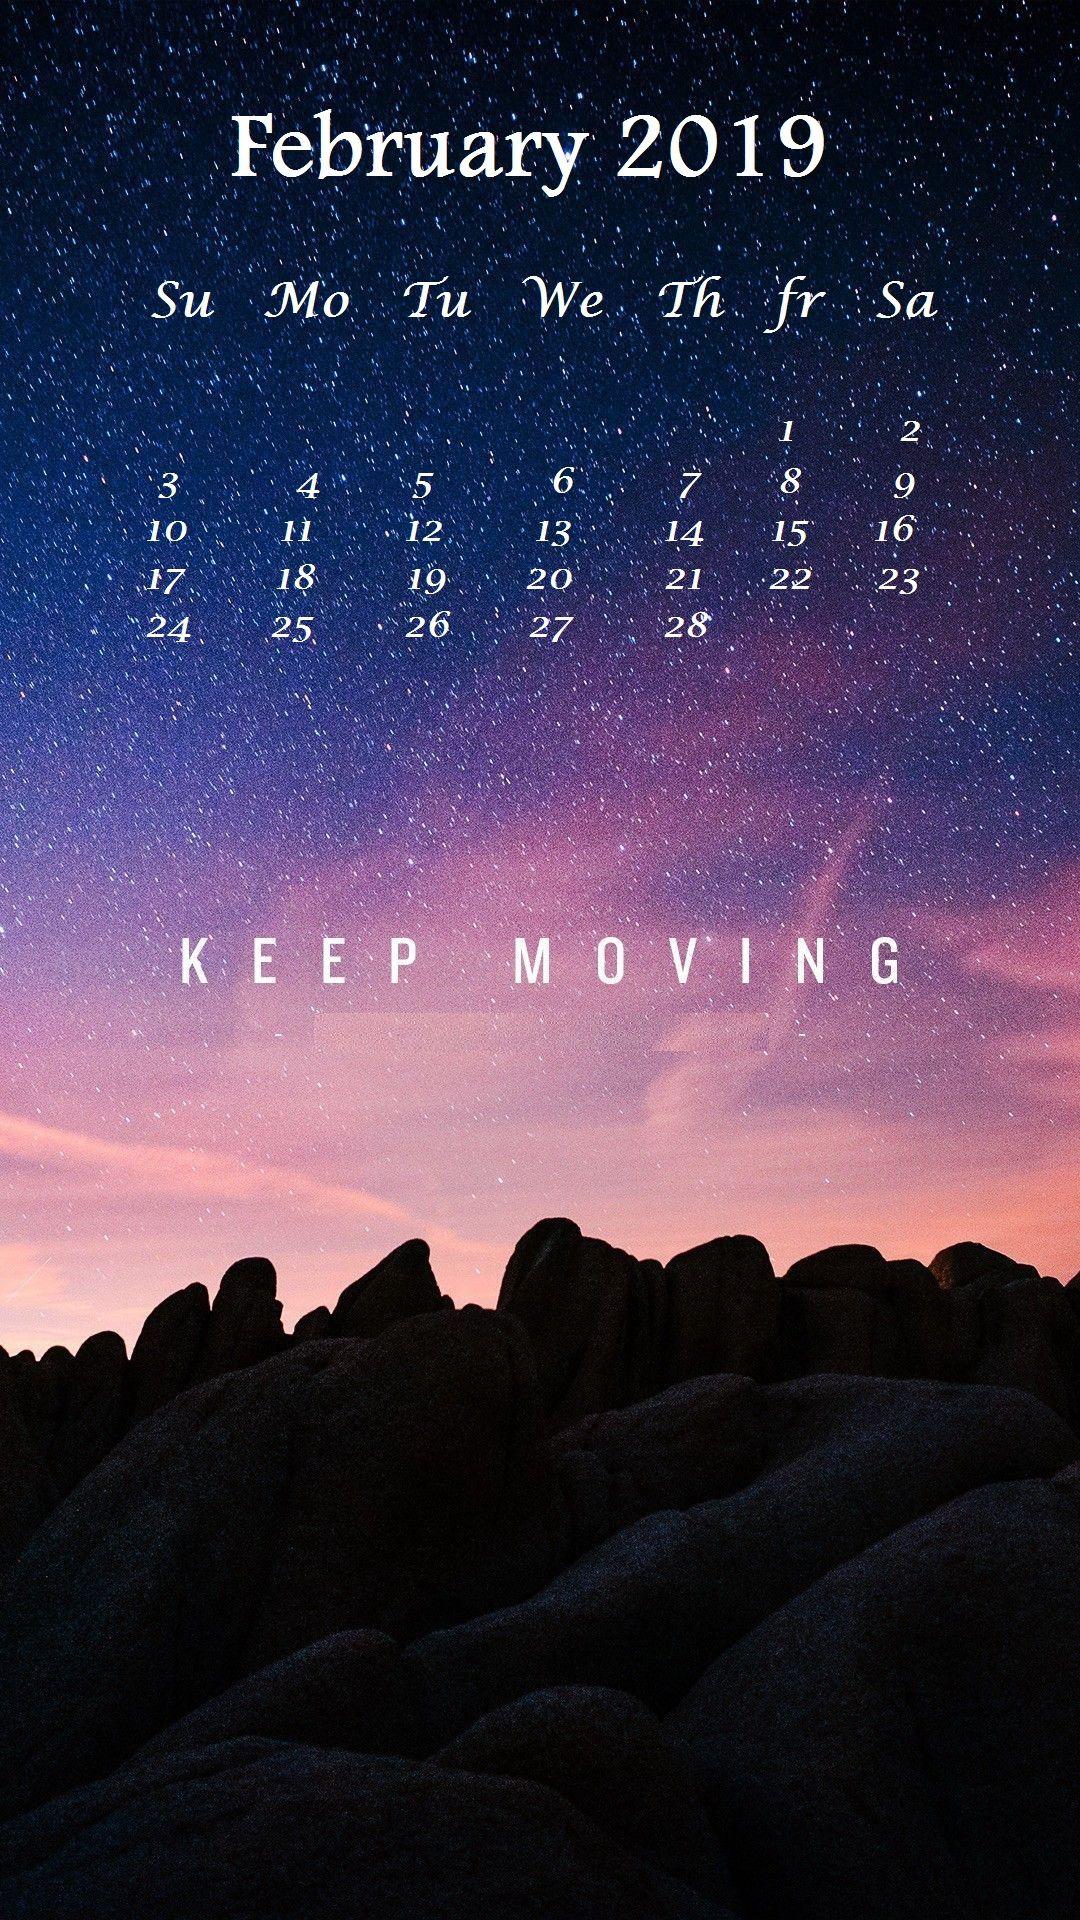 February 2019 Best Iphone Calendar February Wallpaper, - Keep Moving Forward Iphone , HD Wallpaper & Backgrounds